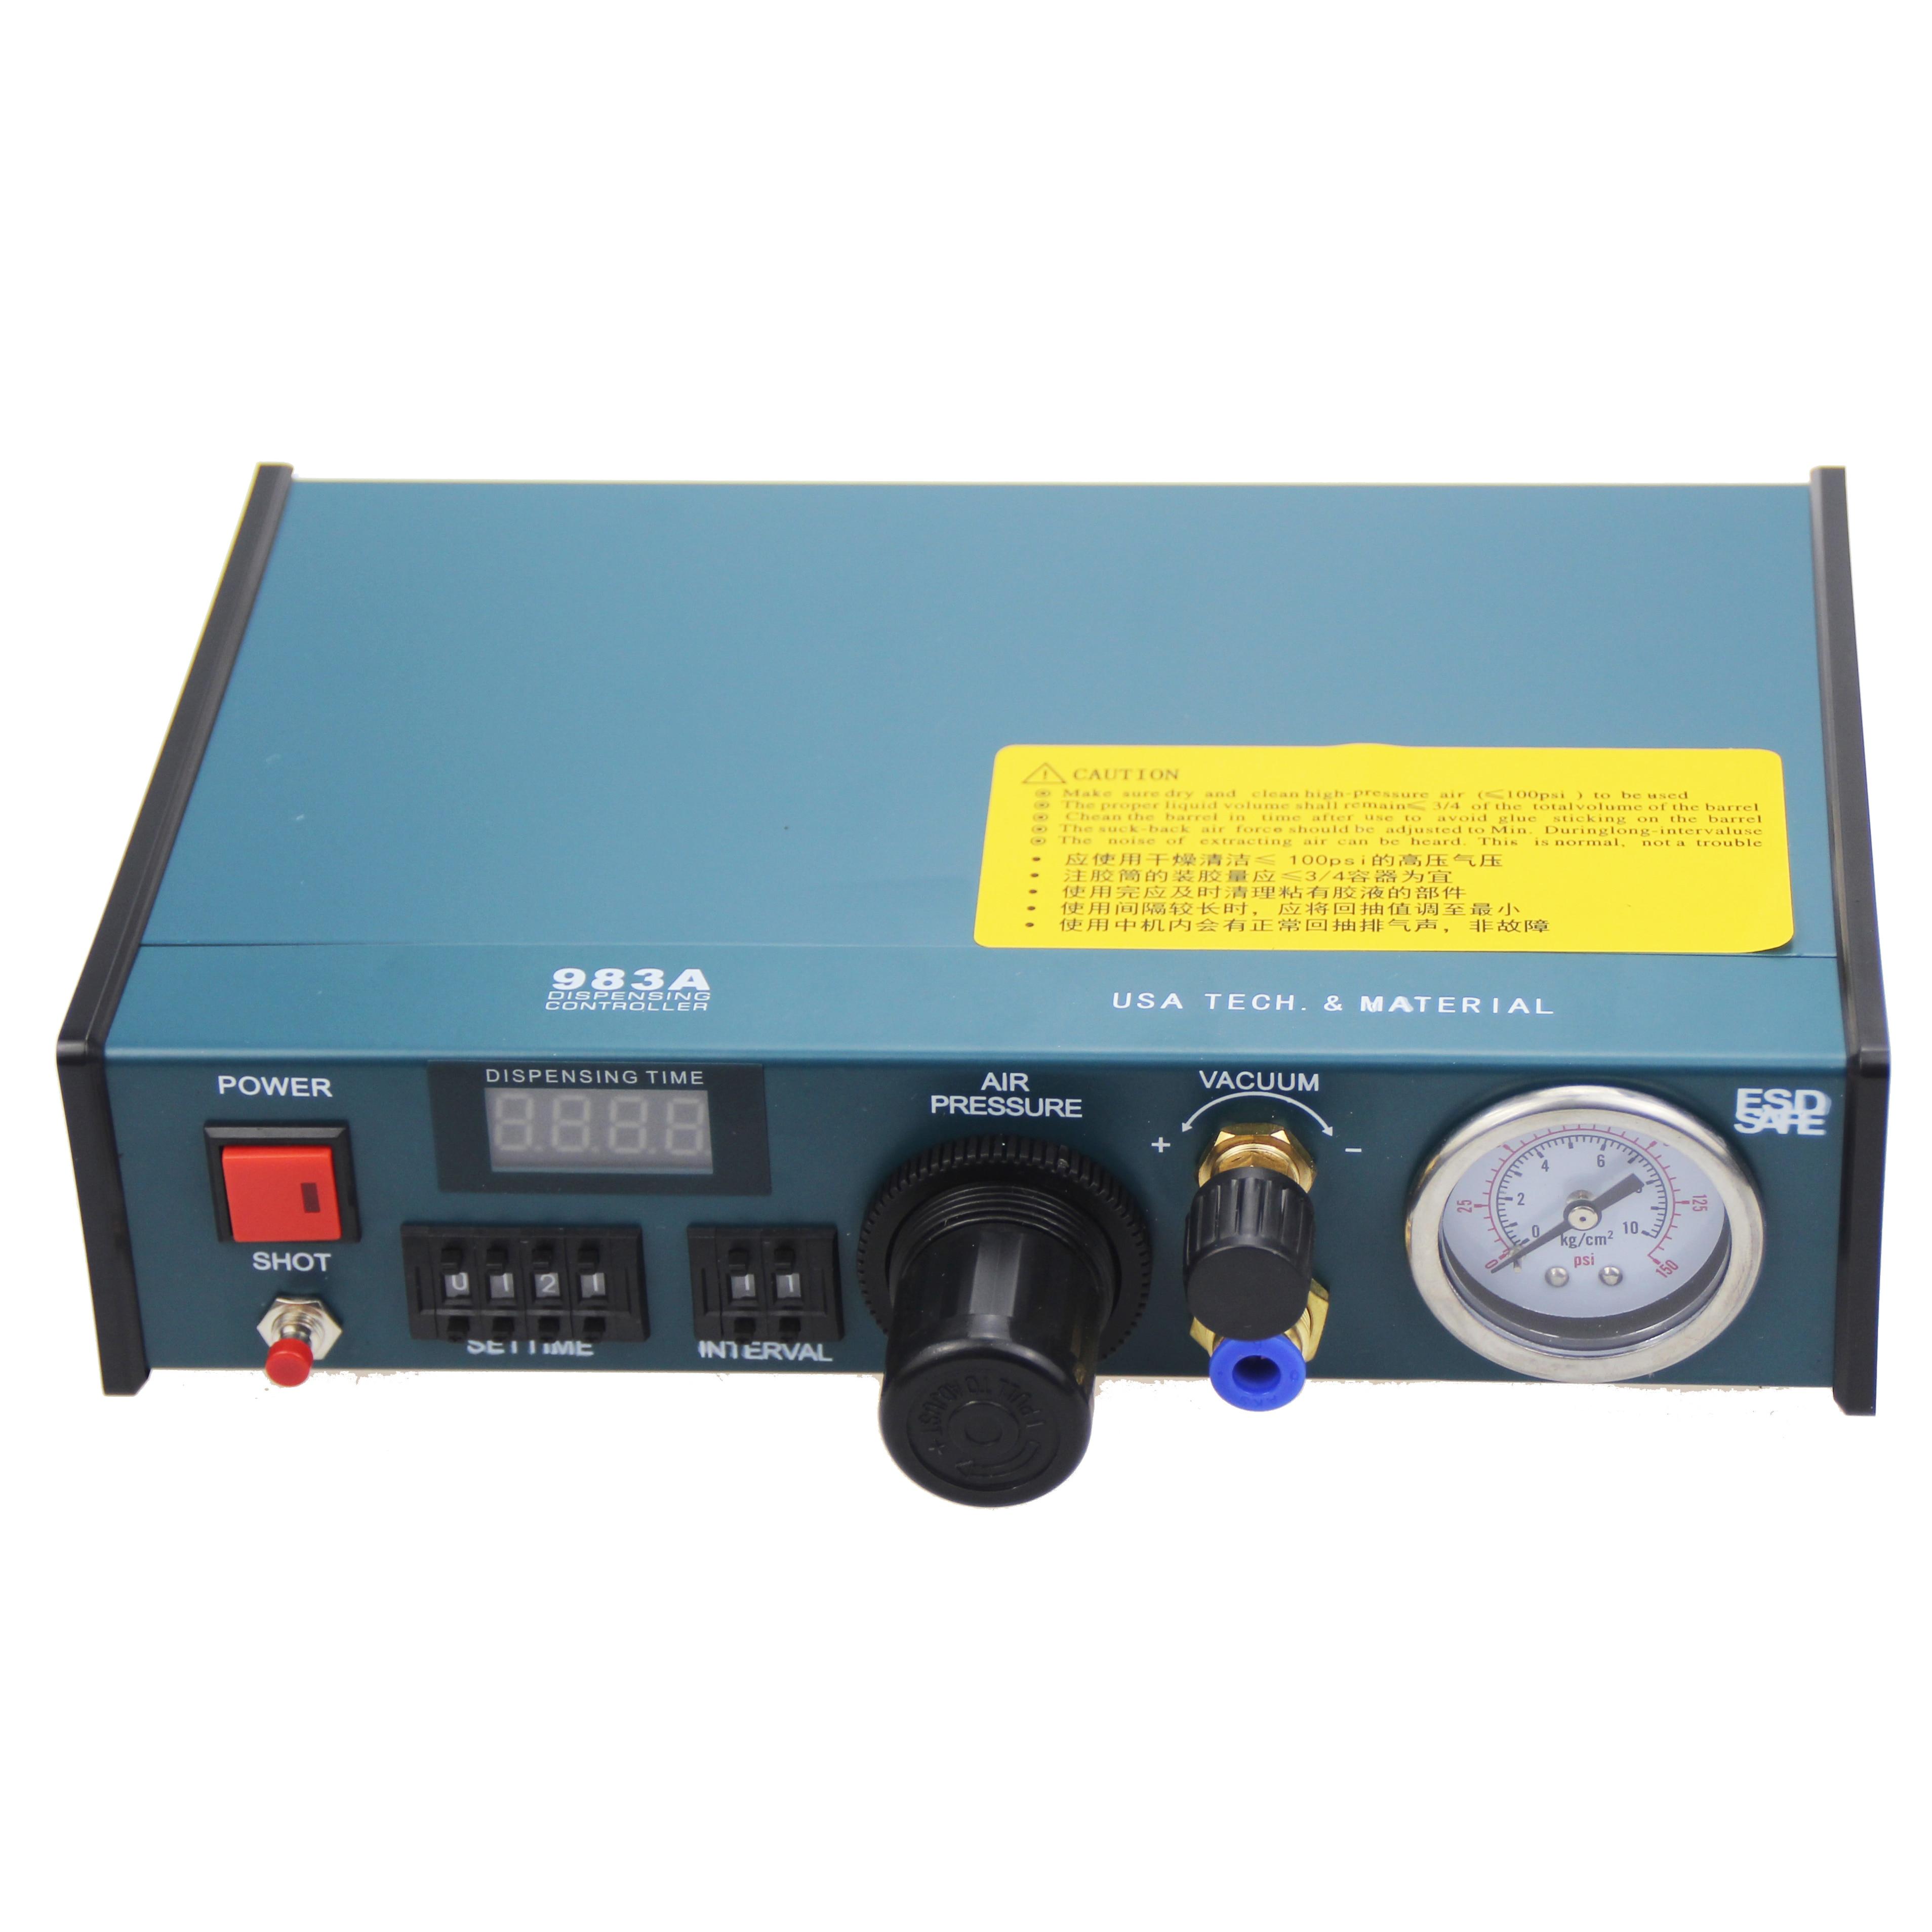 Free shipping VBP-983A Professional Precise Digital Auto Glue Dispenser Solder Paste Liquid Controller Dropper 220V